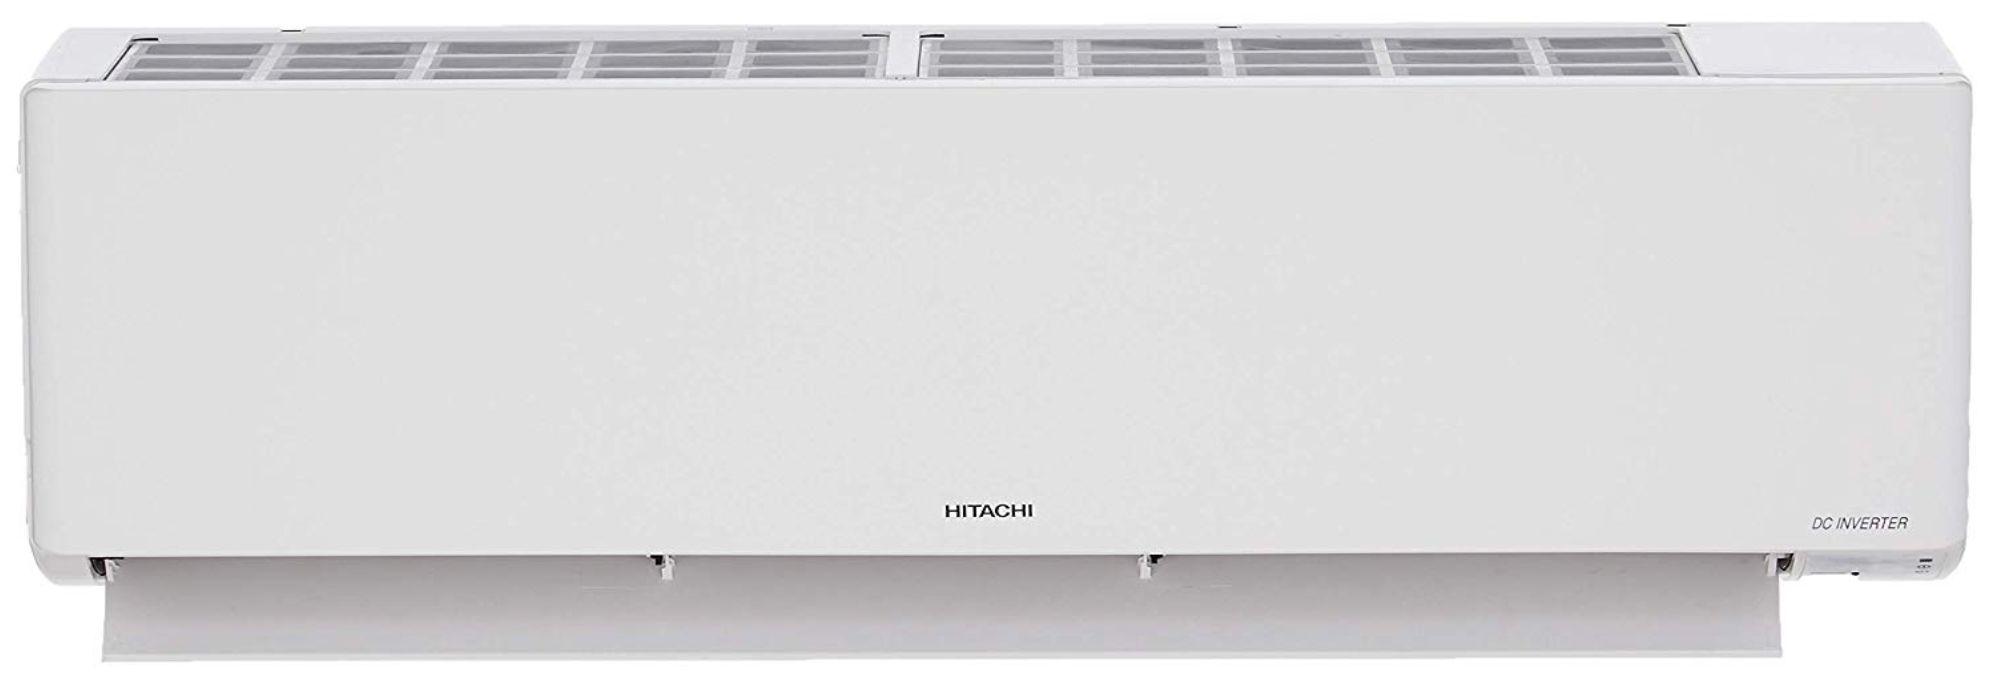 Best AC in India - Hitachi RSD317HCEA Inverter Split AC